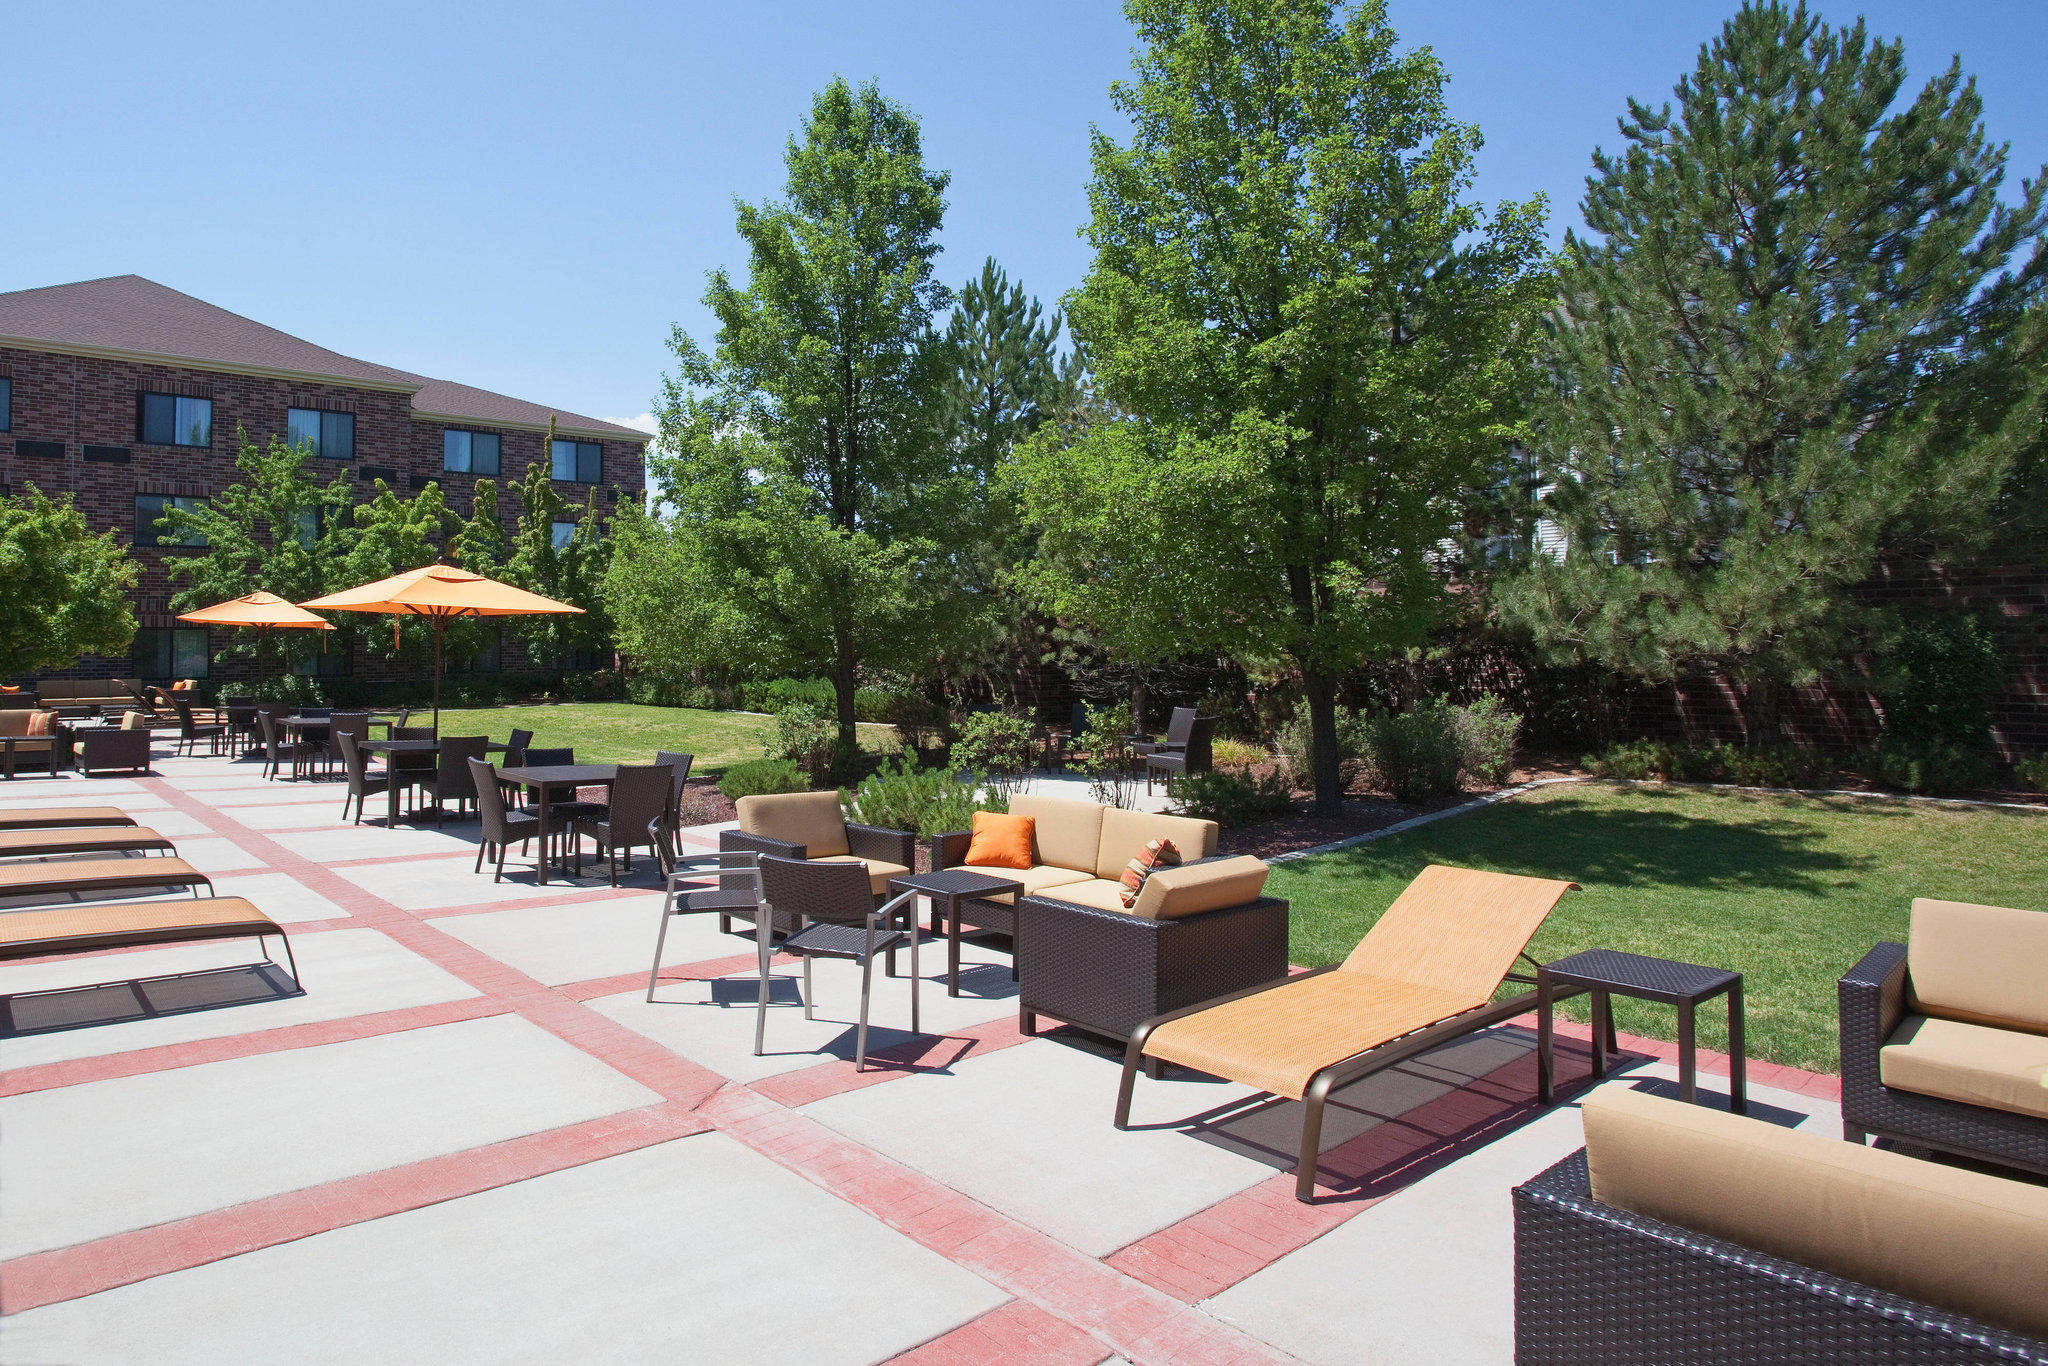 Courtyard by Marriott Salt Lake City Airport